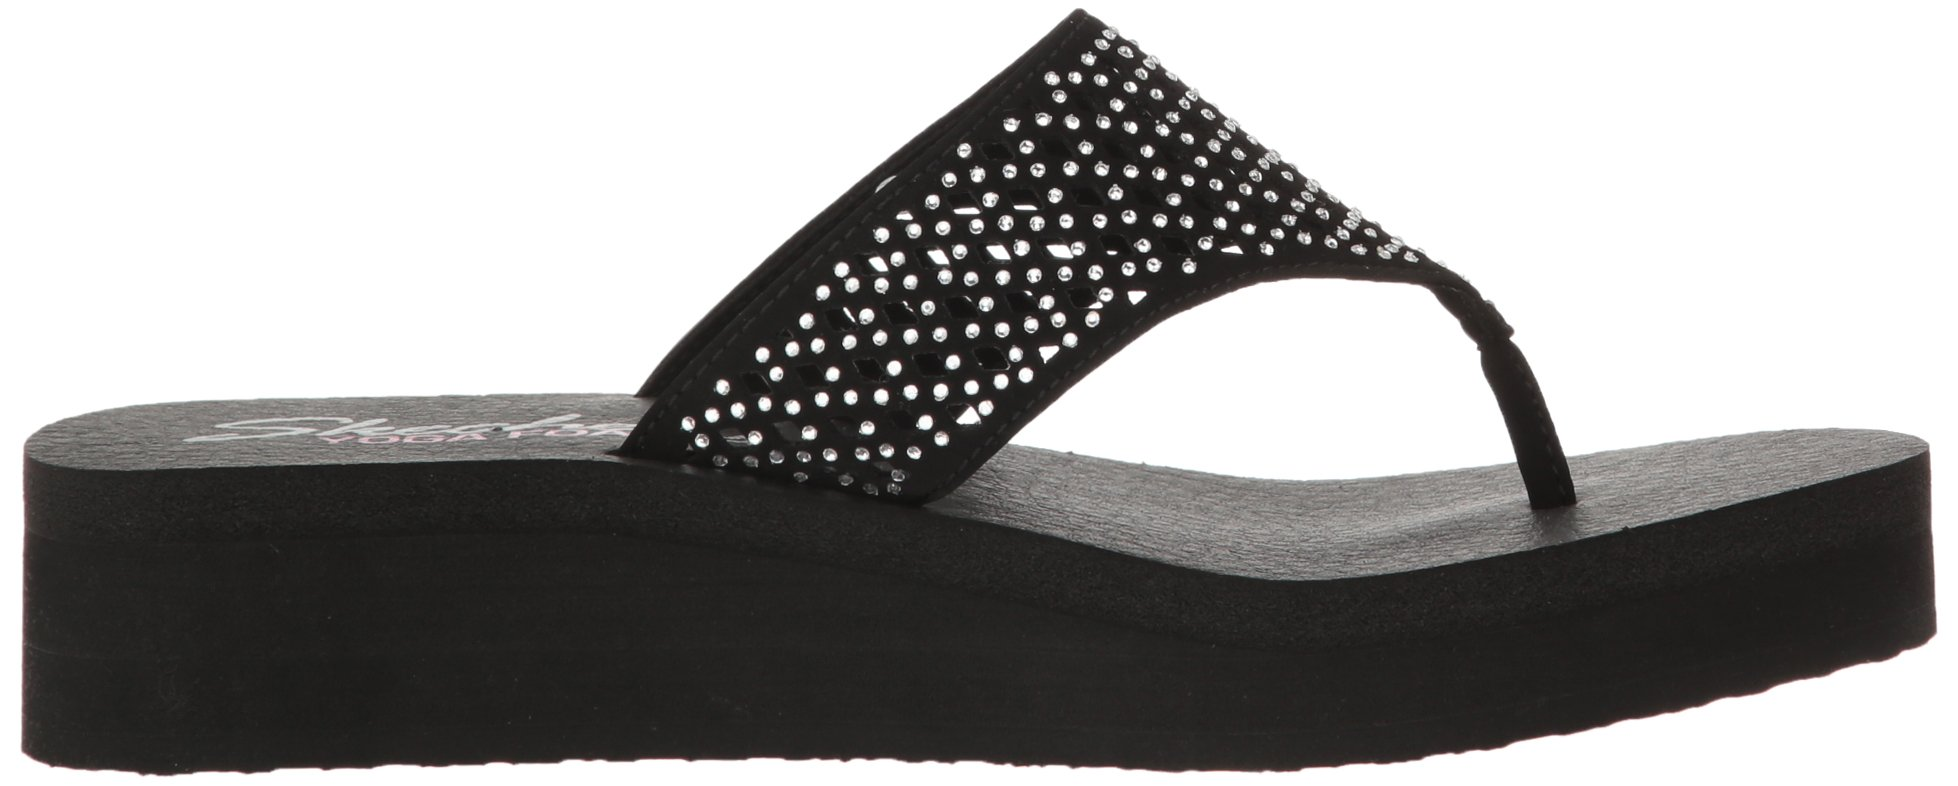 Skechers Cali Women's Vinyasa Flow Wedge Sandal, Black Cutout, 6 B(M) US by Skechers (Image #7)